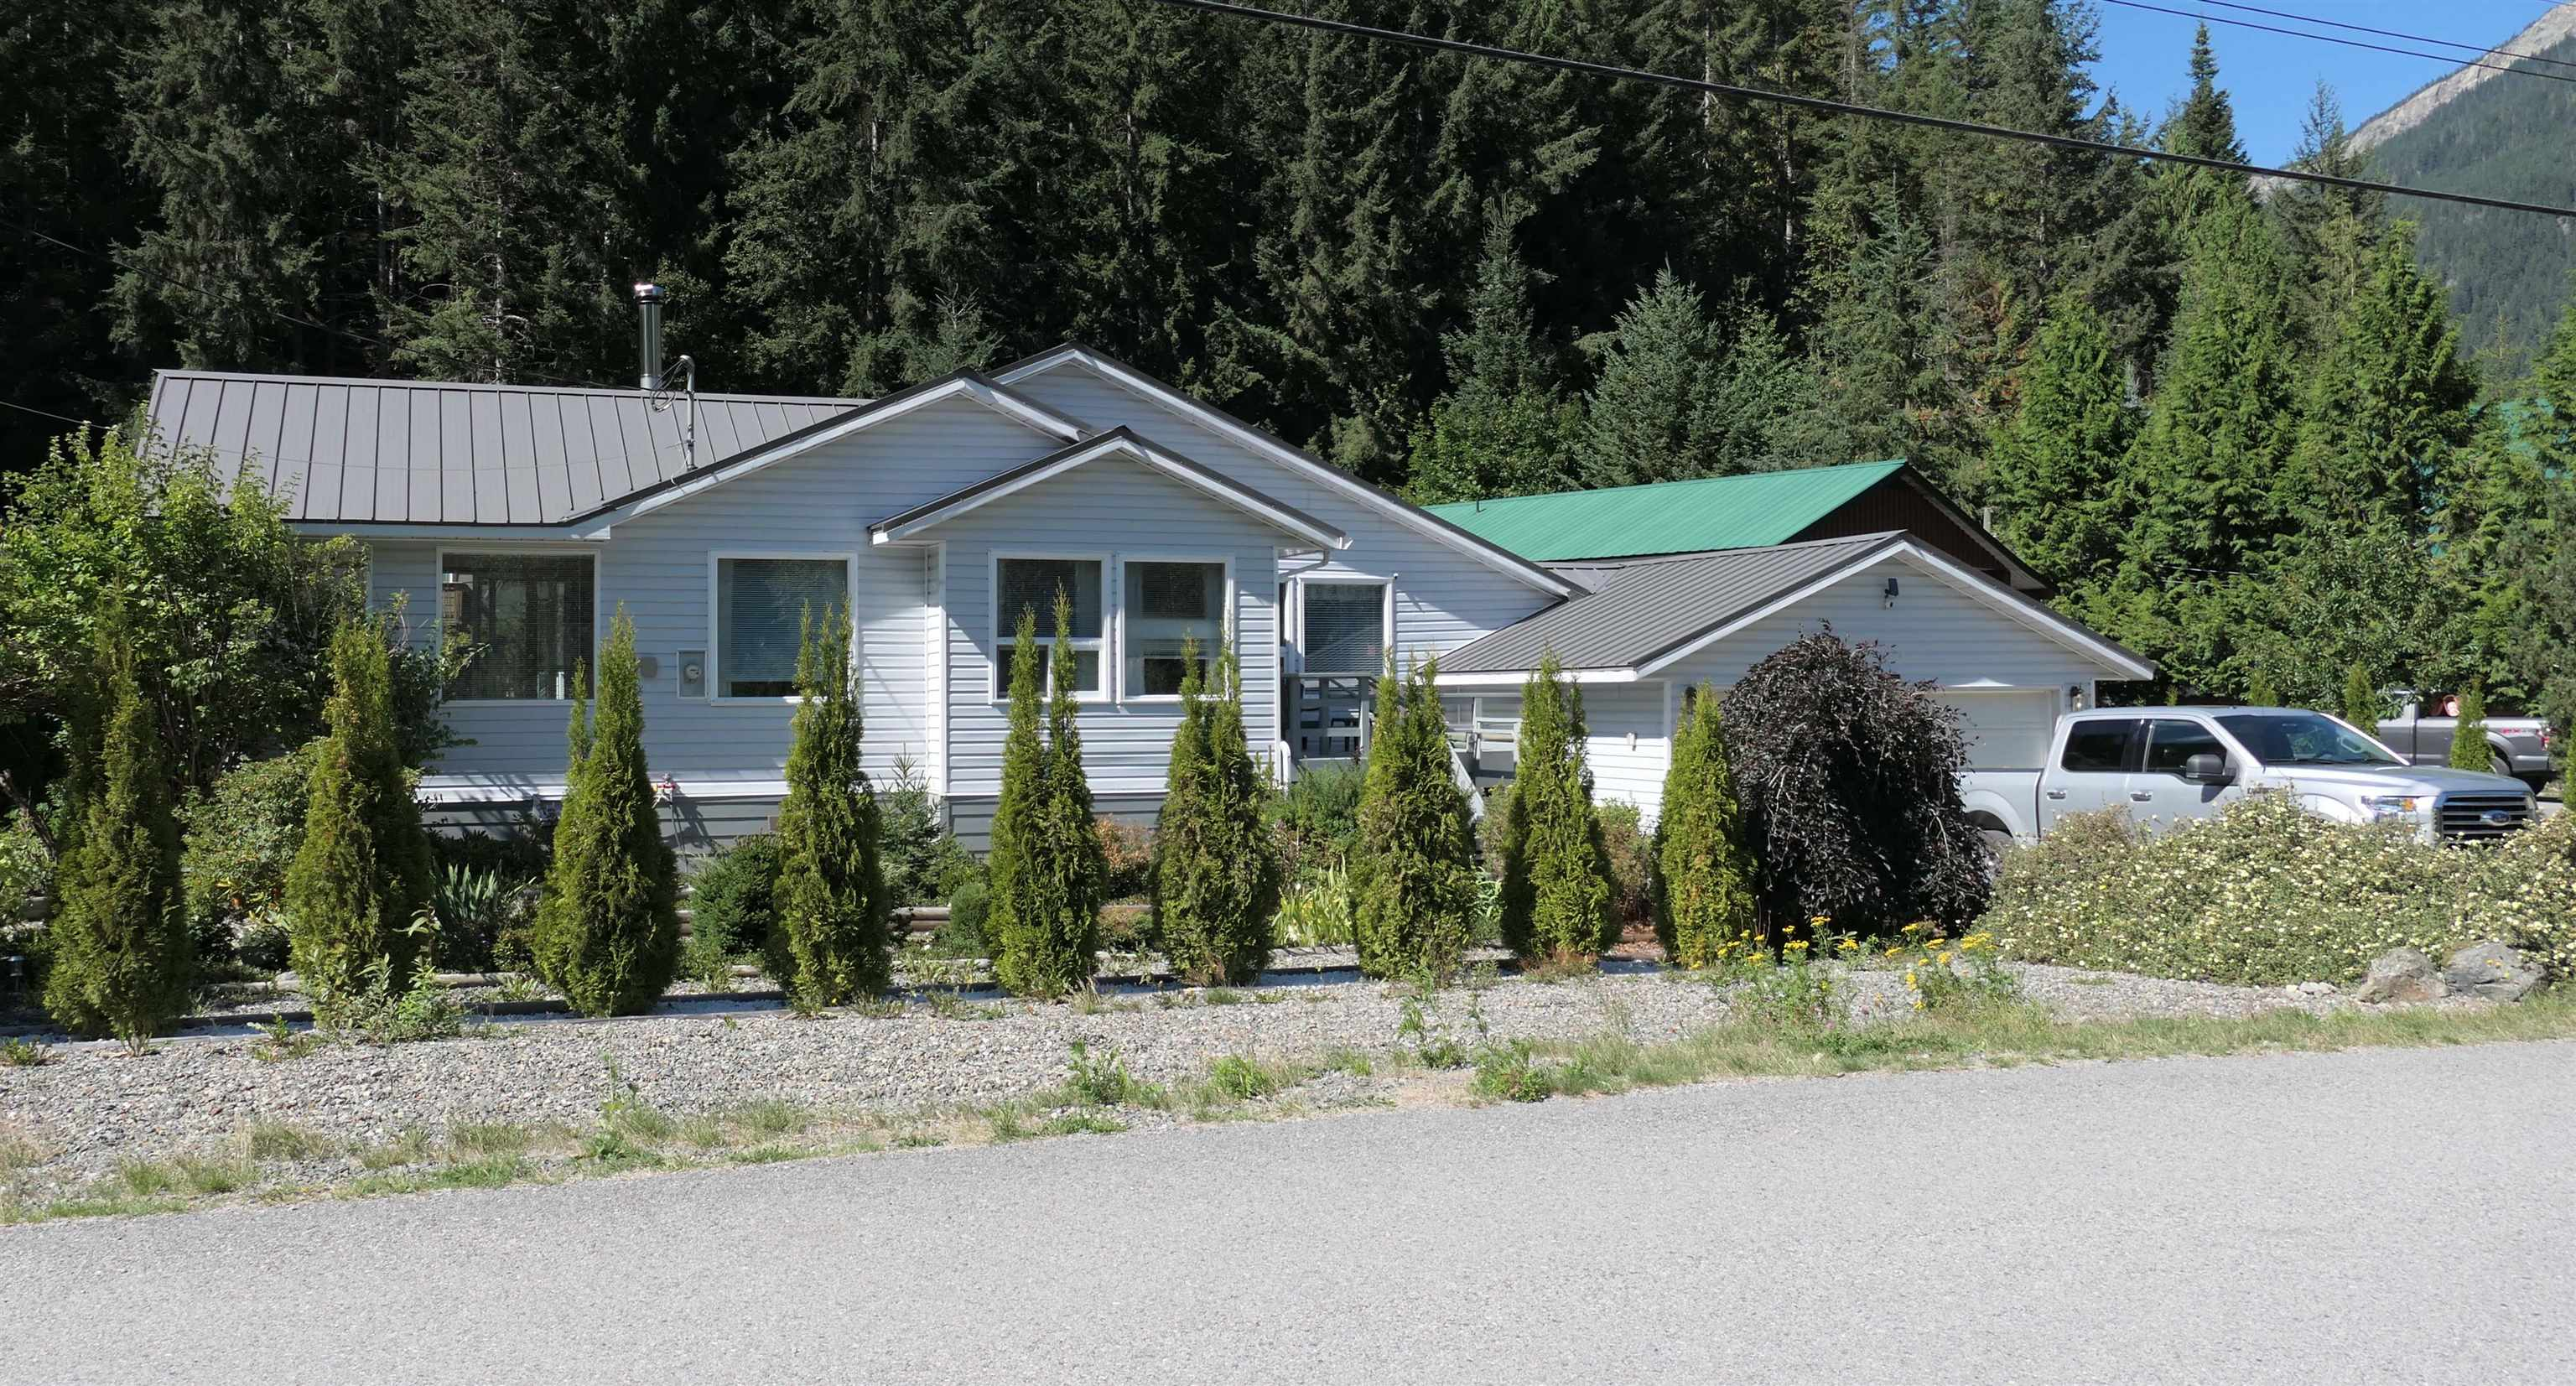 14731 ALPINE BOULEVARD - Hope Sunshine Valley House/Single Family for sale, 2 Bedrooms (R2623614) - #1